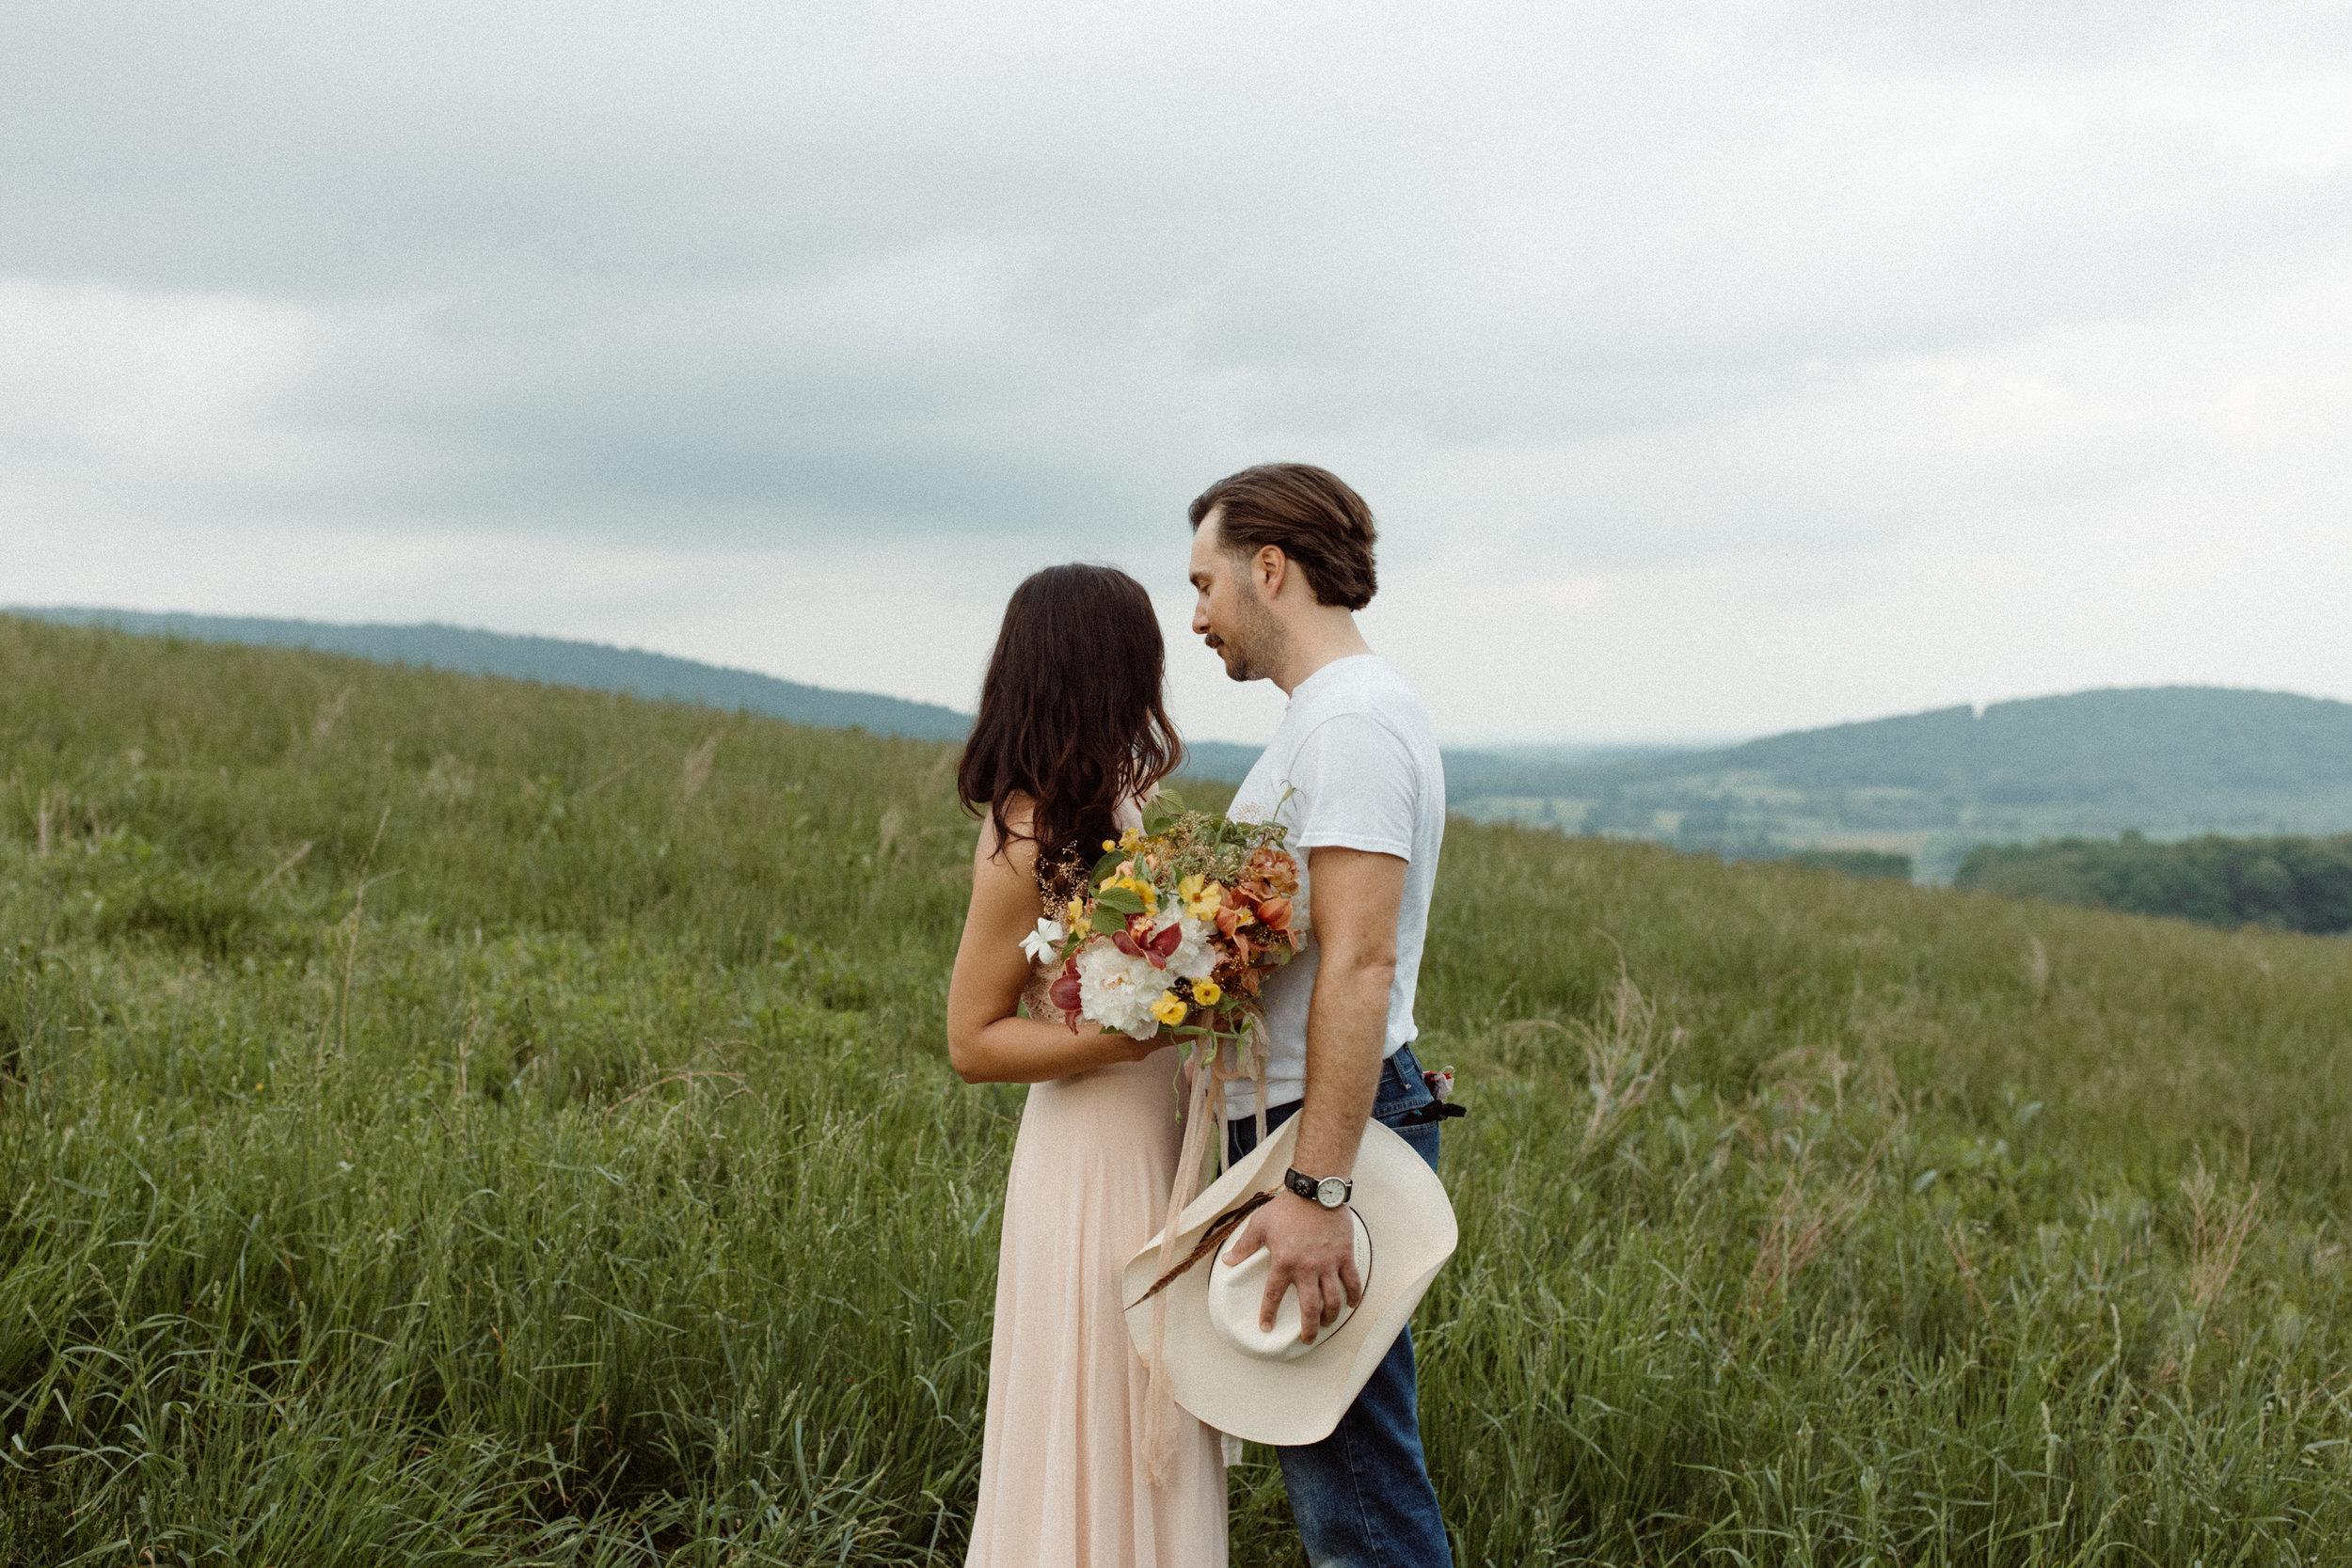 kelsey&mark-engagement-skymeadows-2019-peytoncurry-9271.jpg